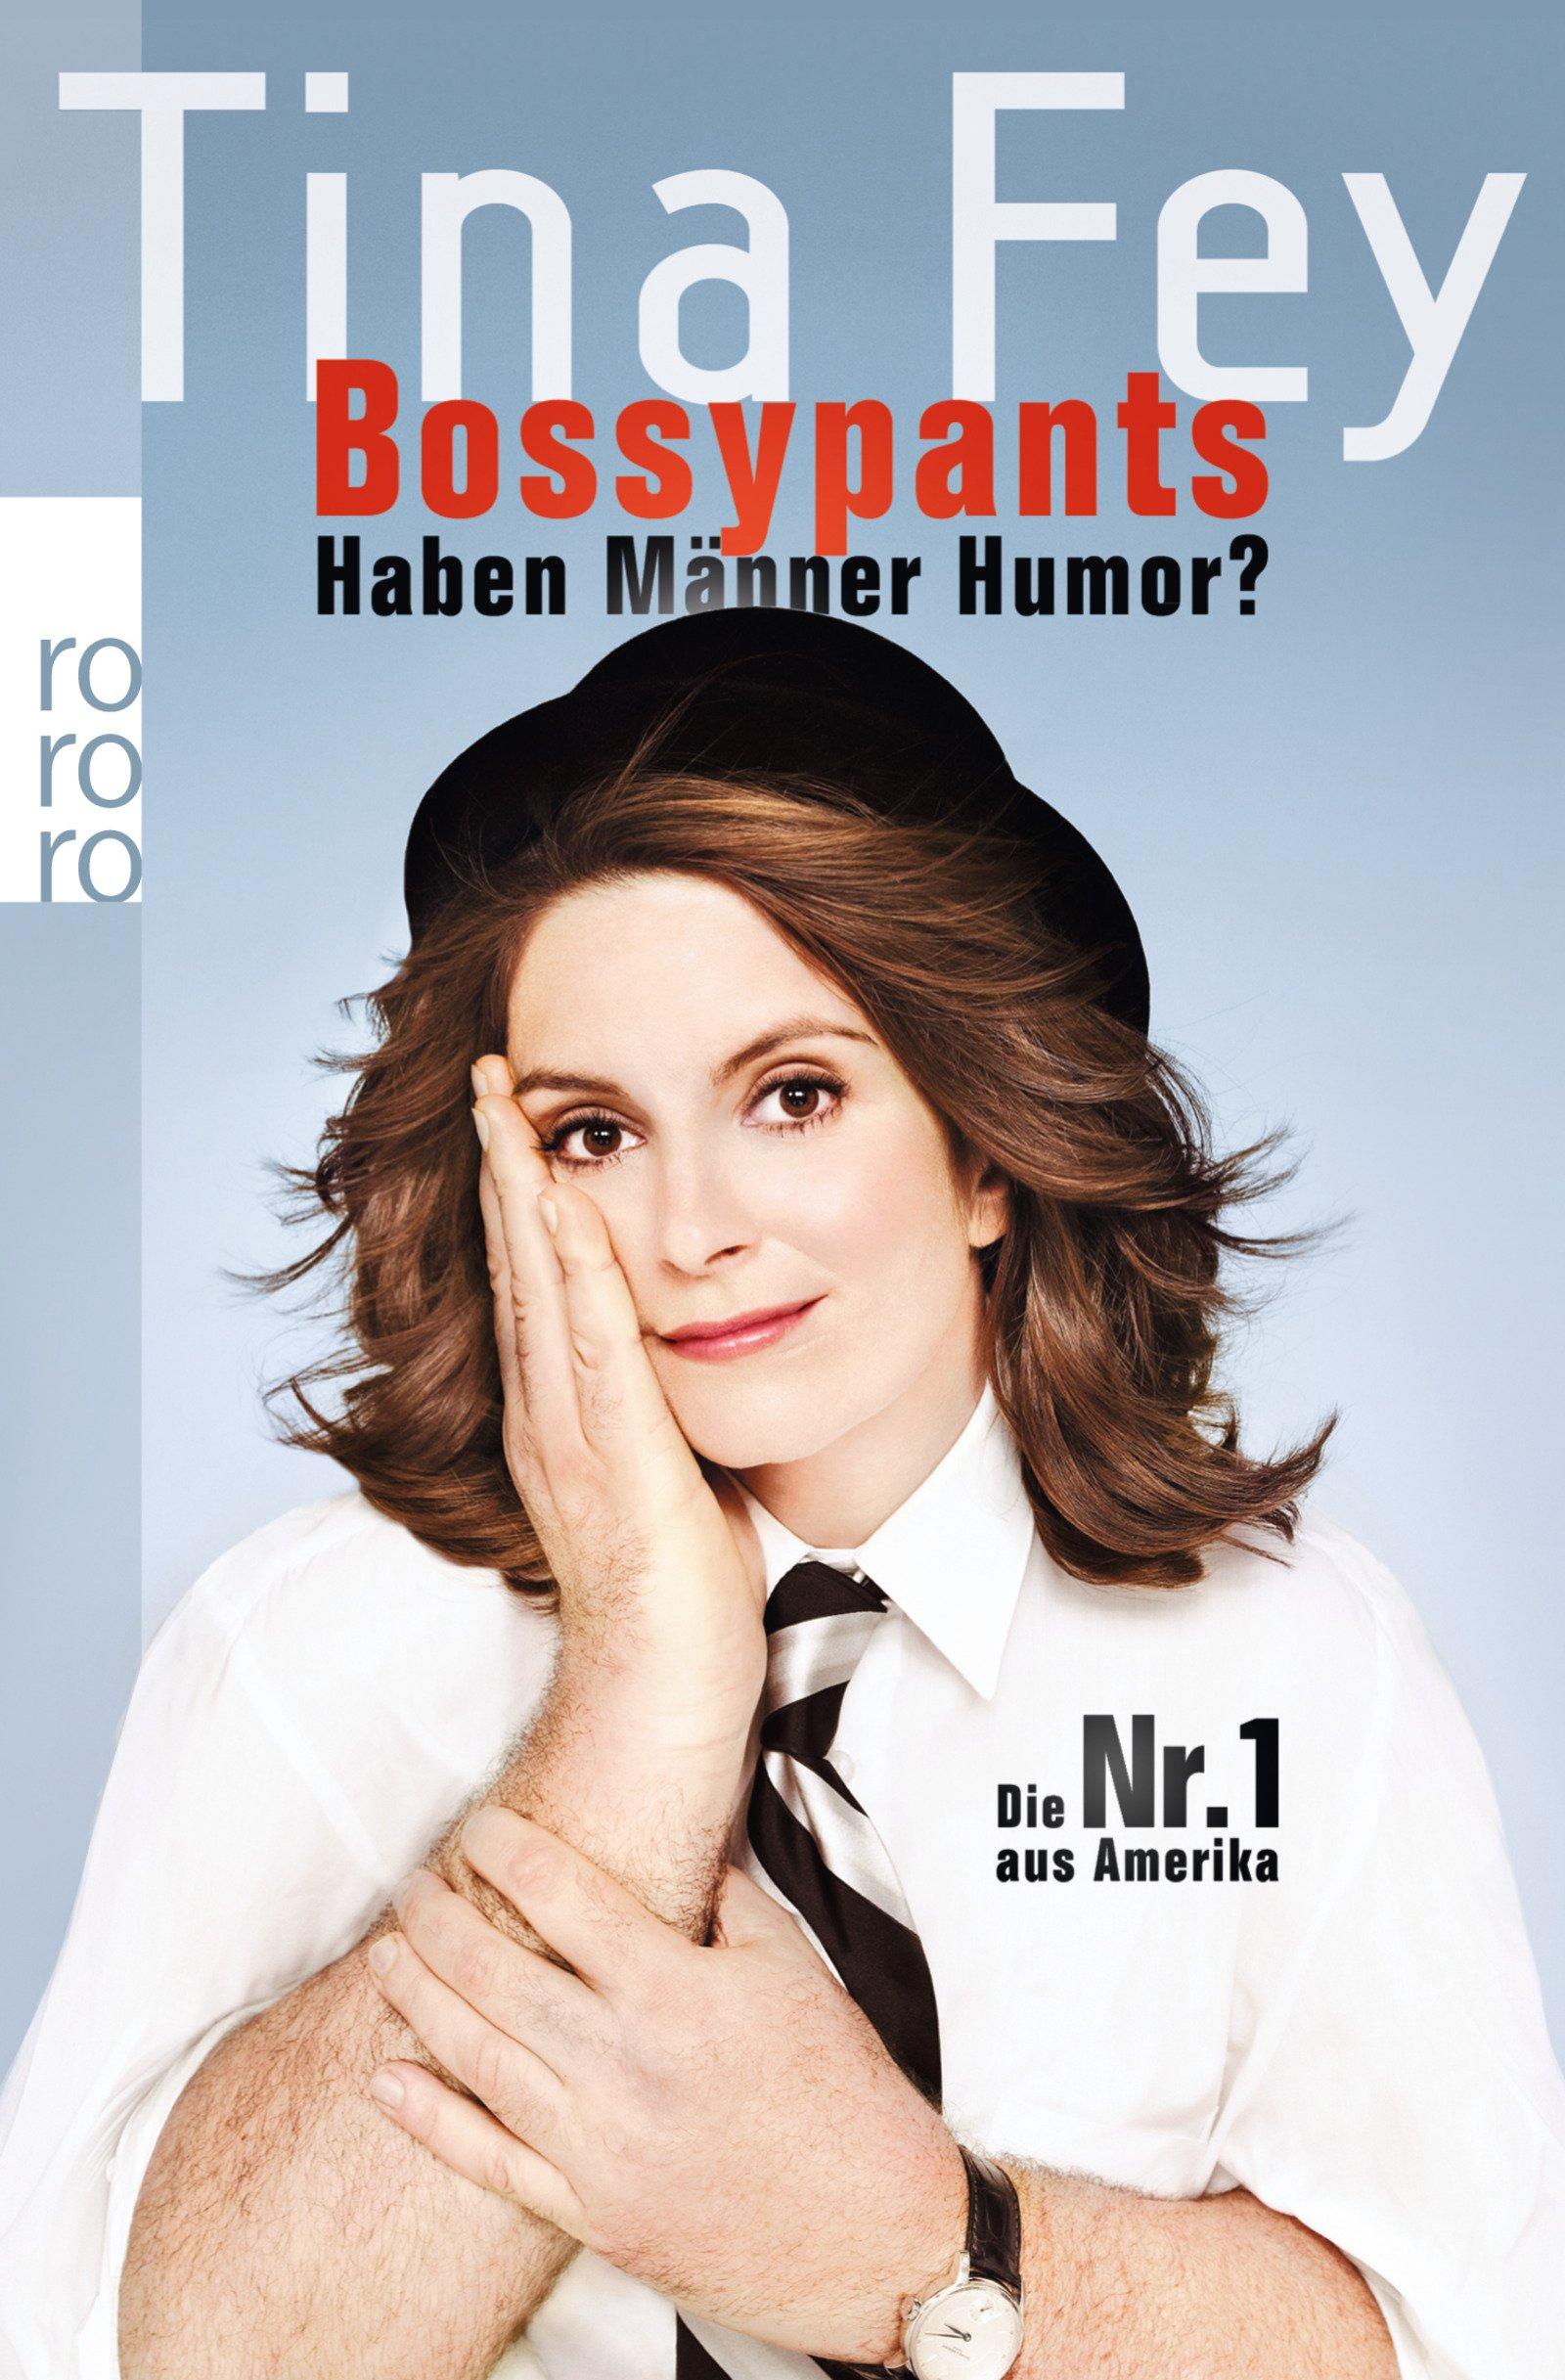 Bossypants: Haben Männer Humor?